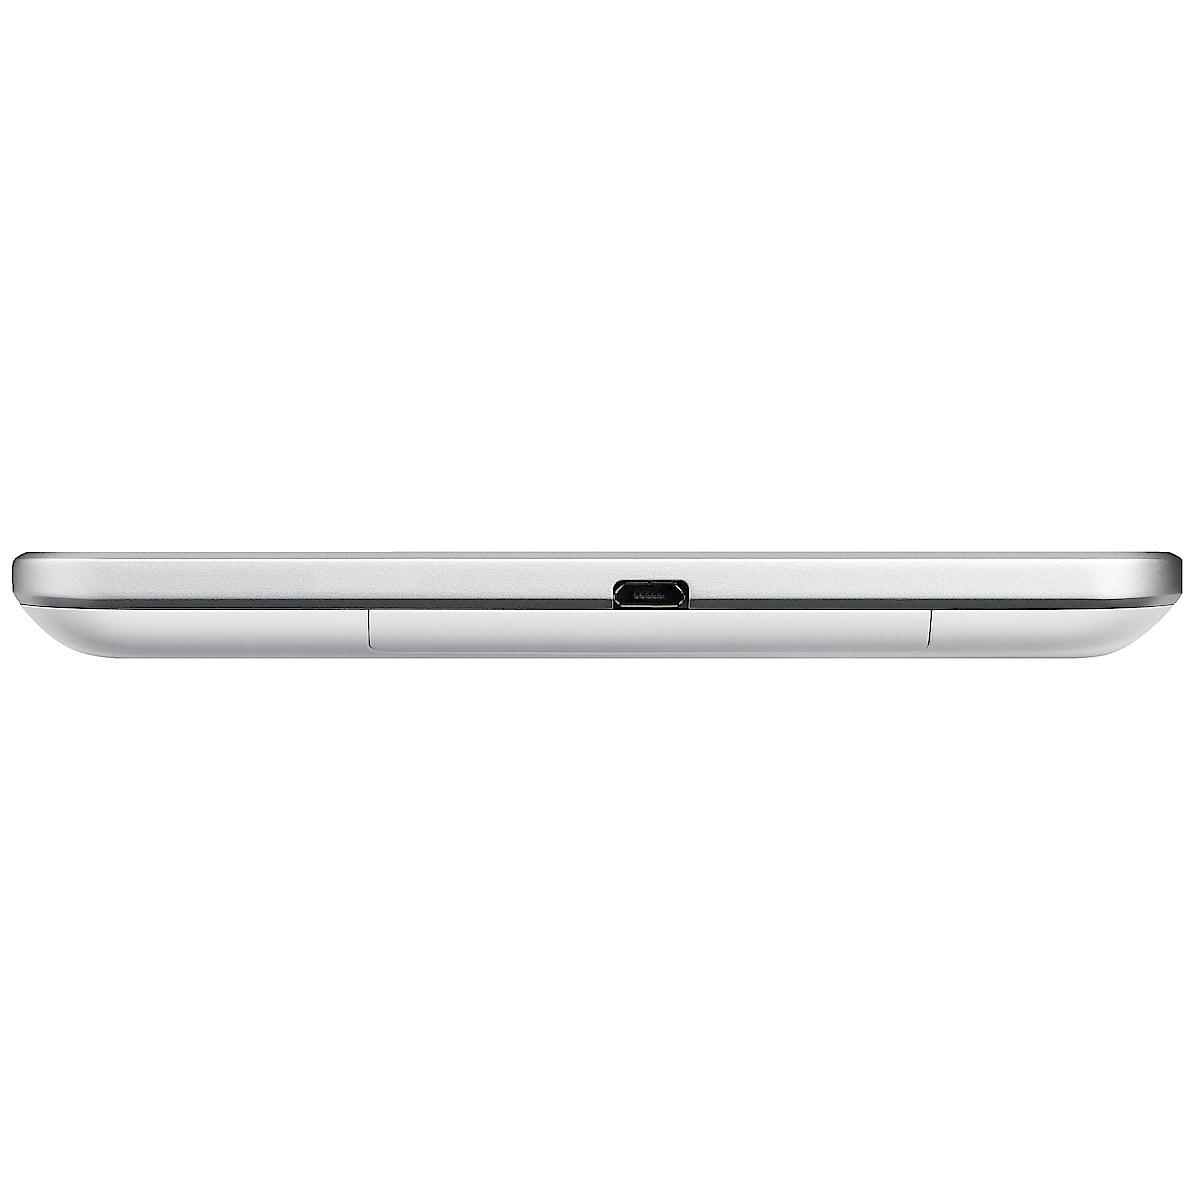 Acer Iconia B1-710 nettbrett